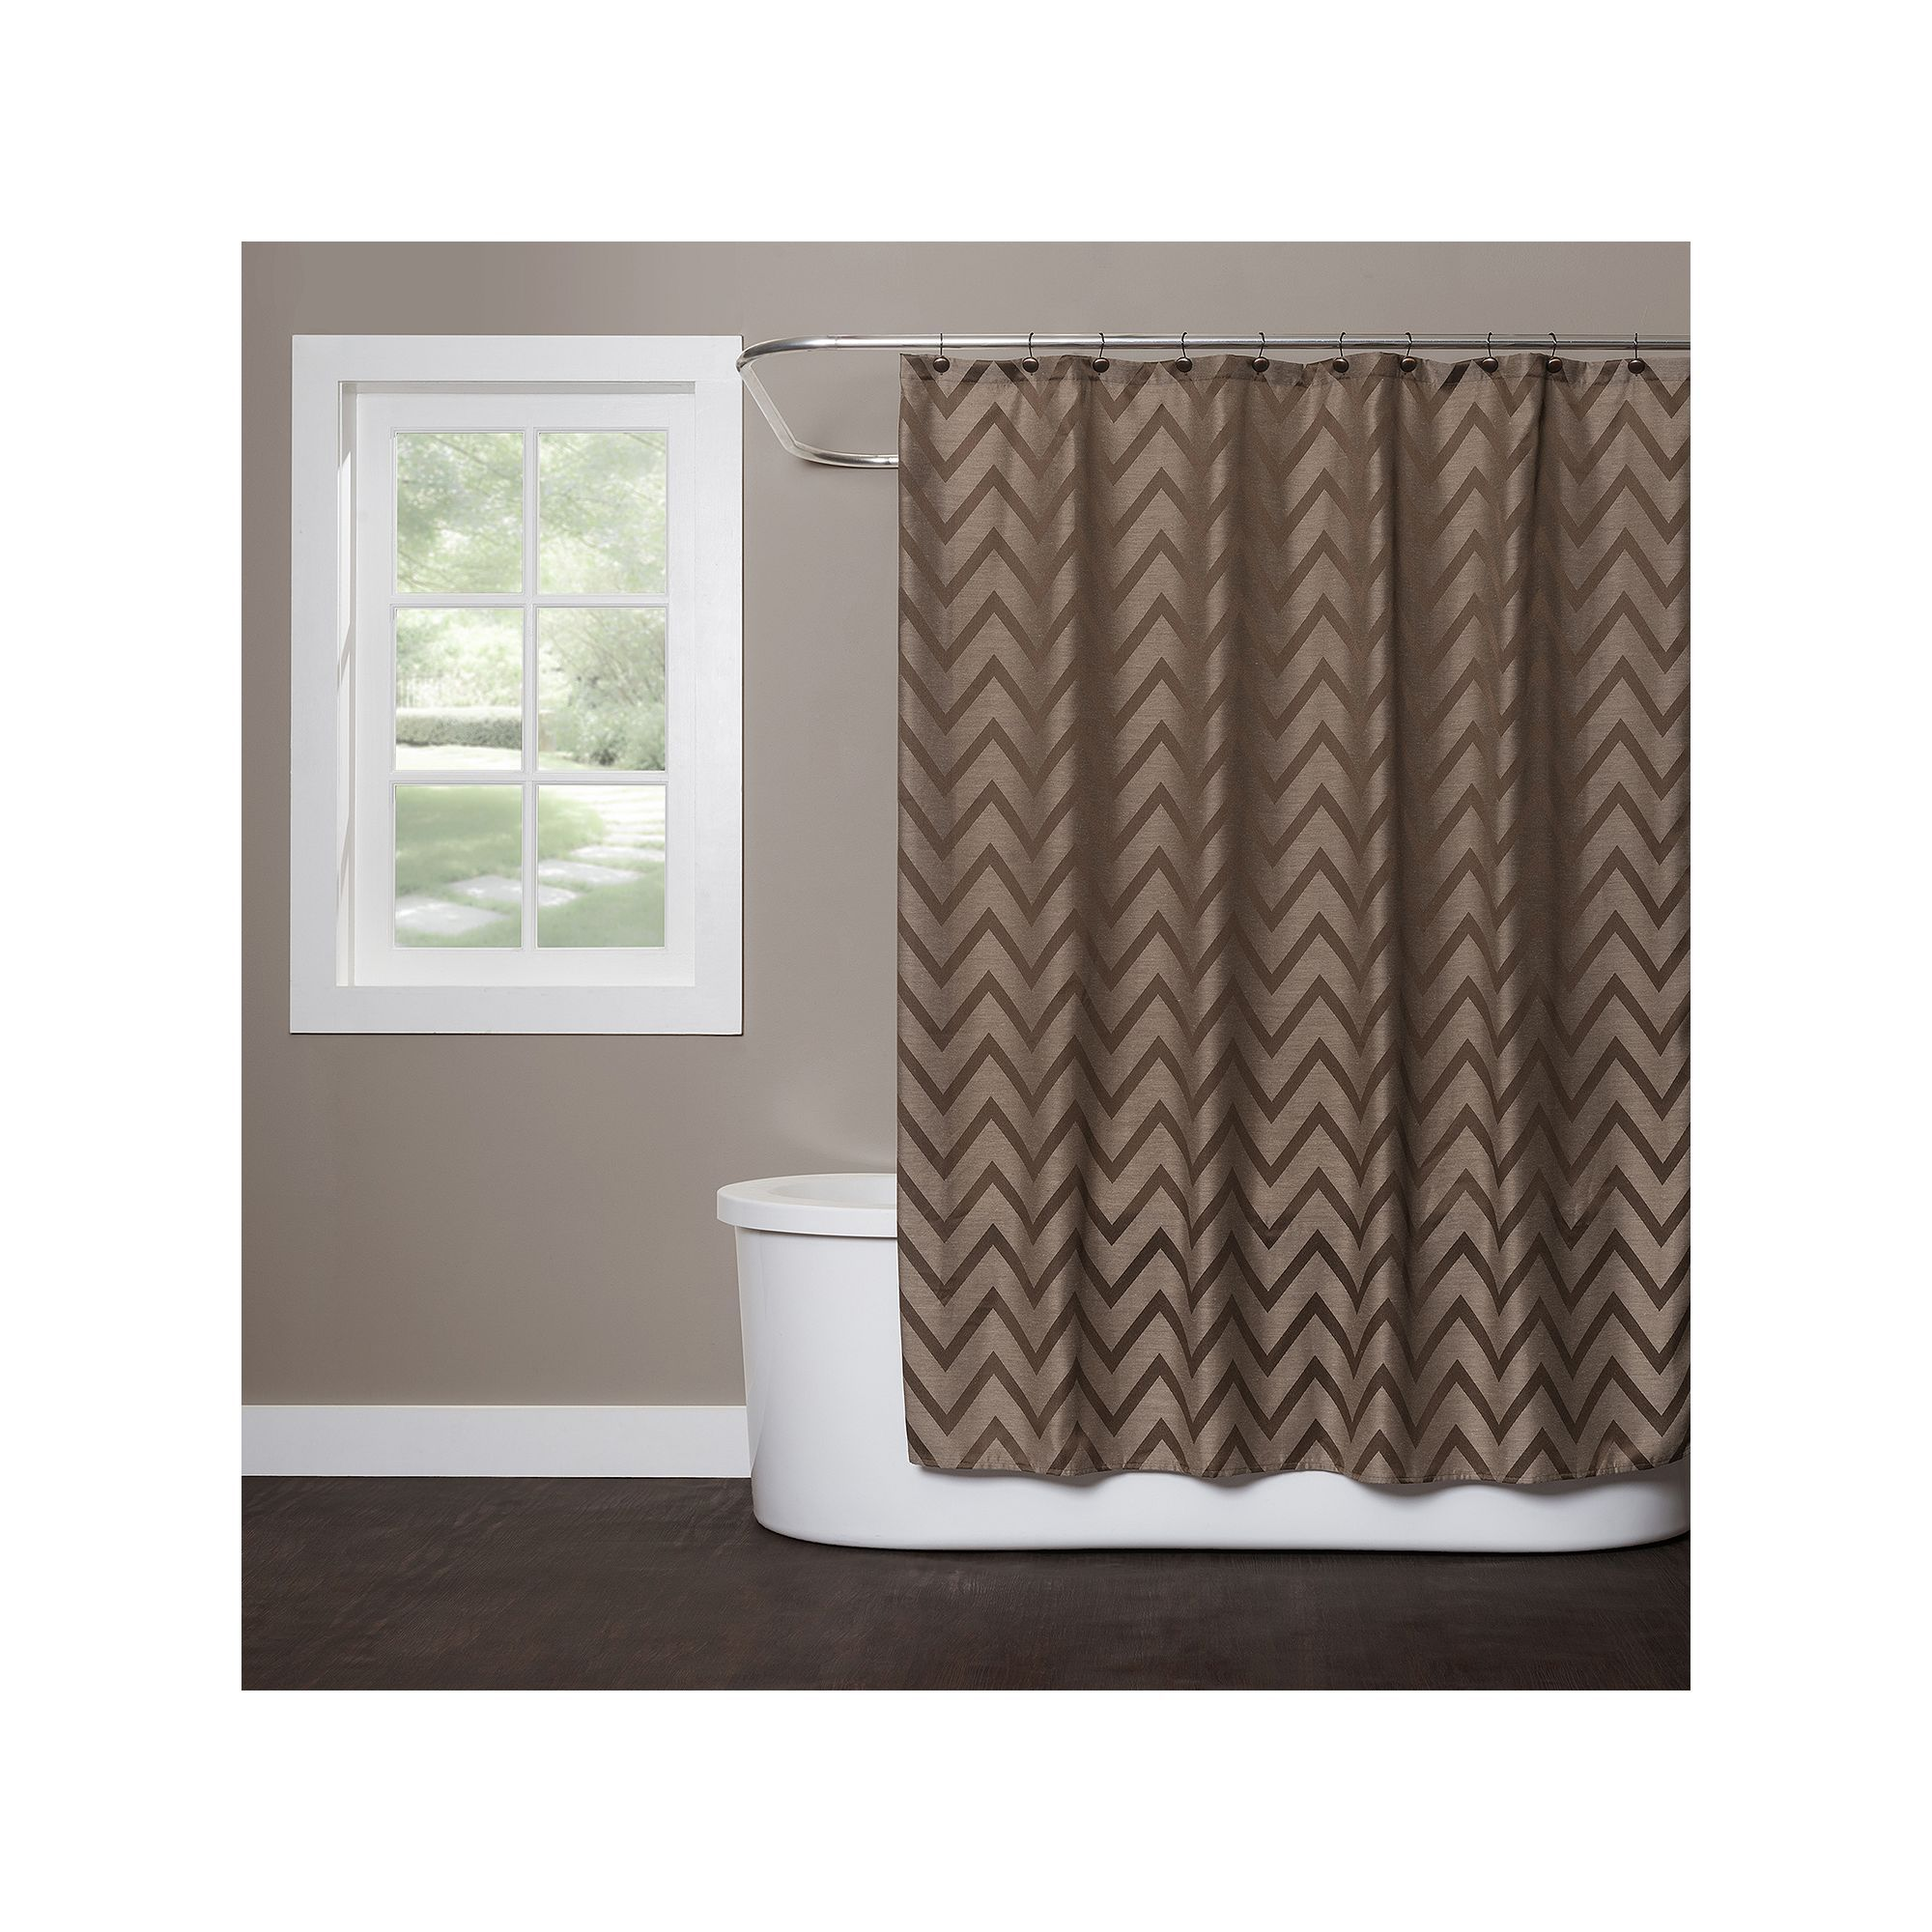 Saturday Knight Ltd Chevron Shower Curtain Brown Rideaux De Douche Motifs